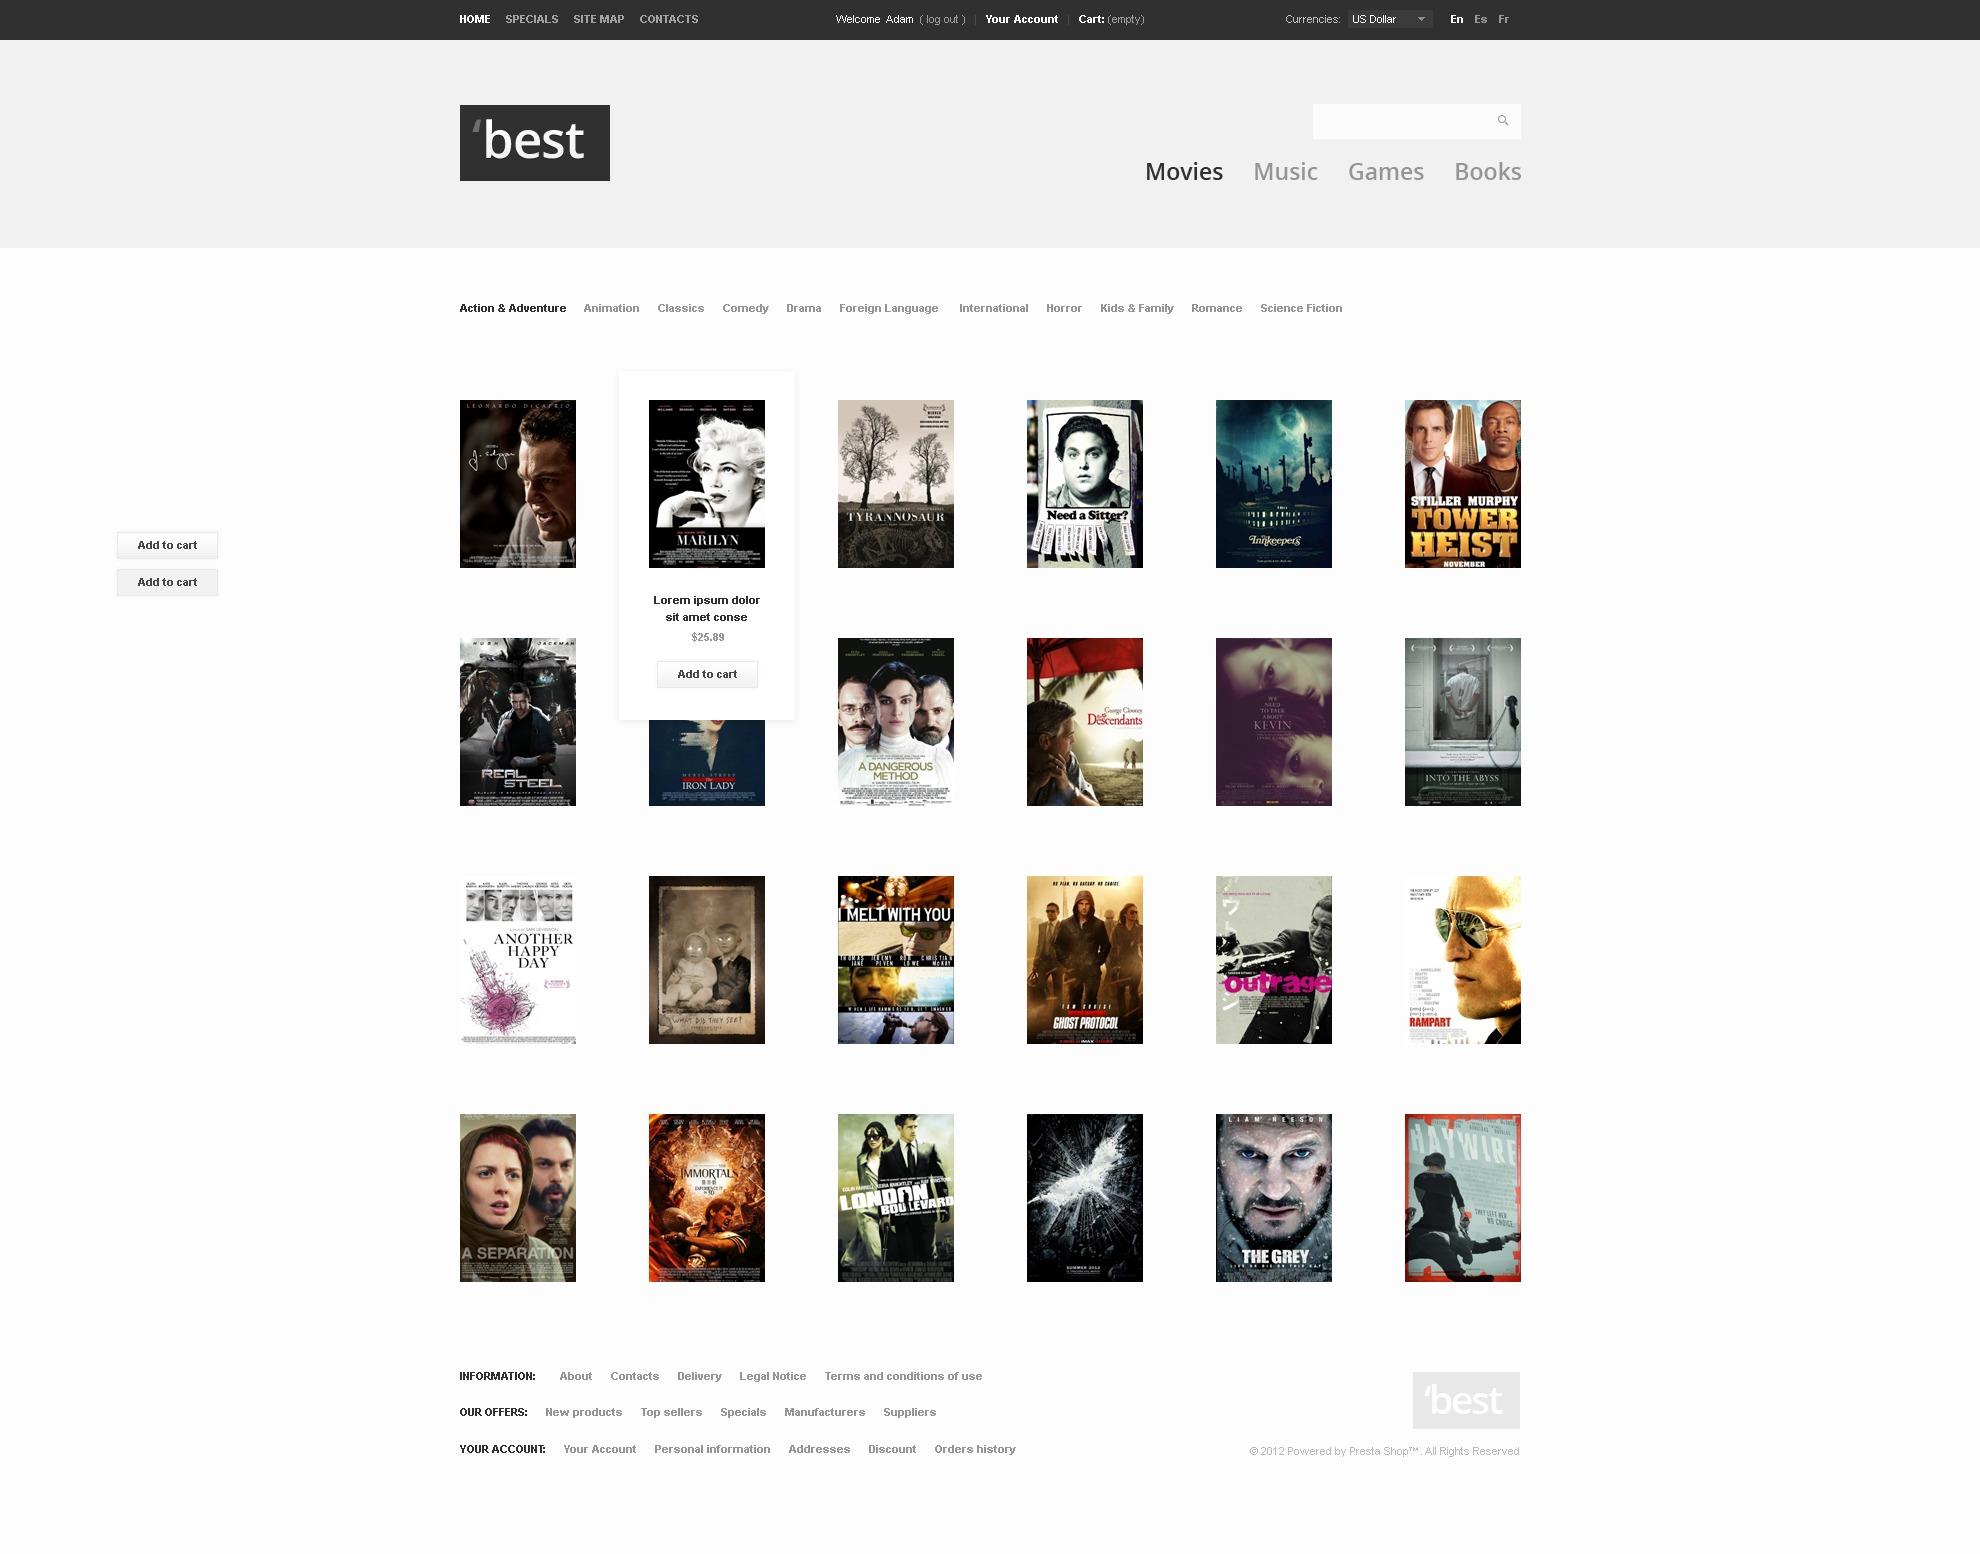 Entertainment portal